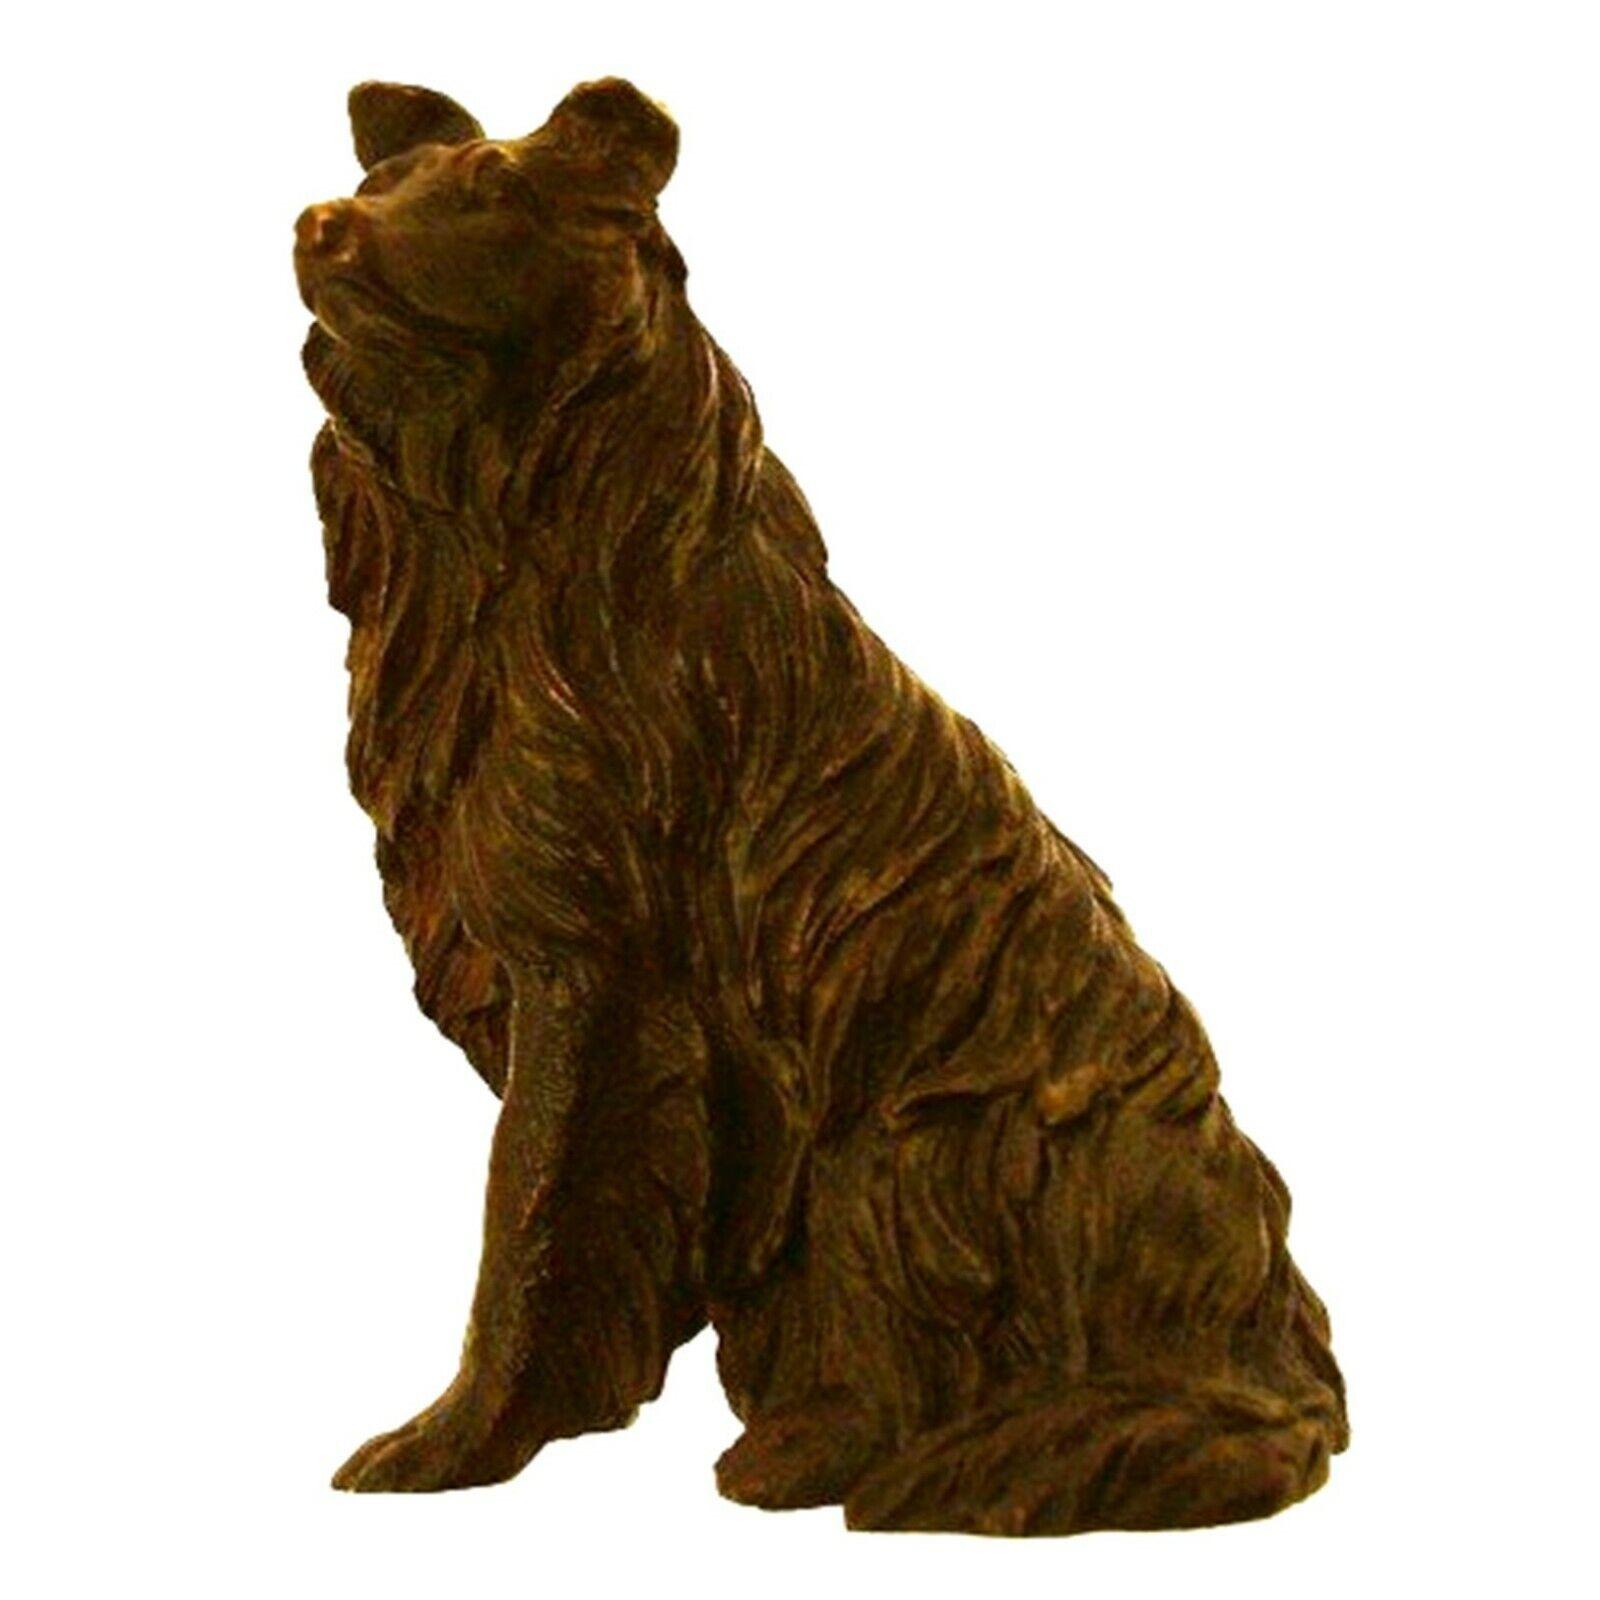 Collie Figurines Collie Dog Bronzes Sculptures Collie Ornamants